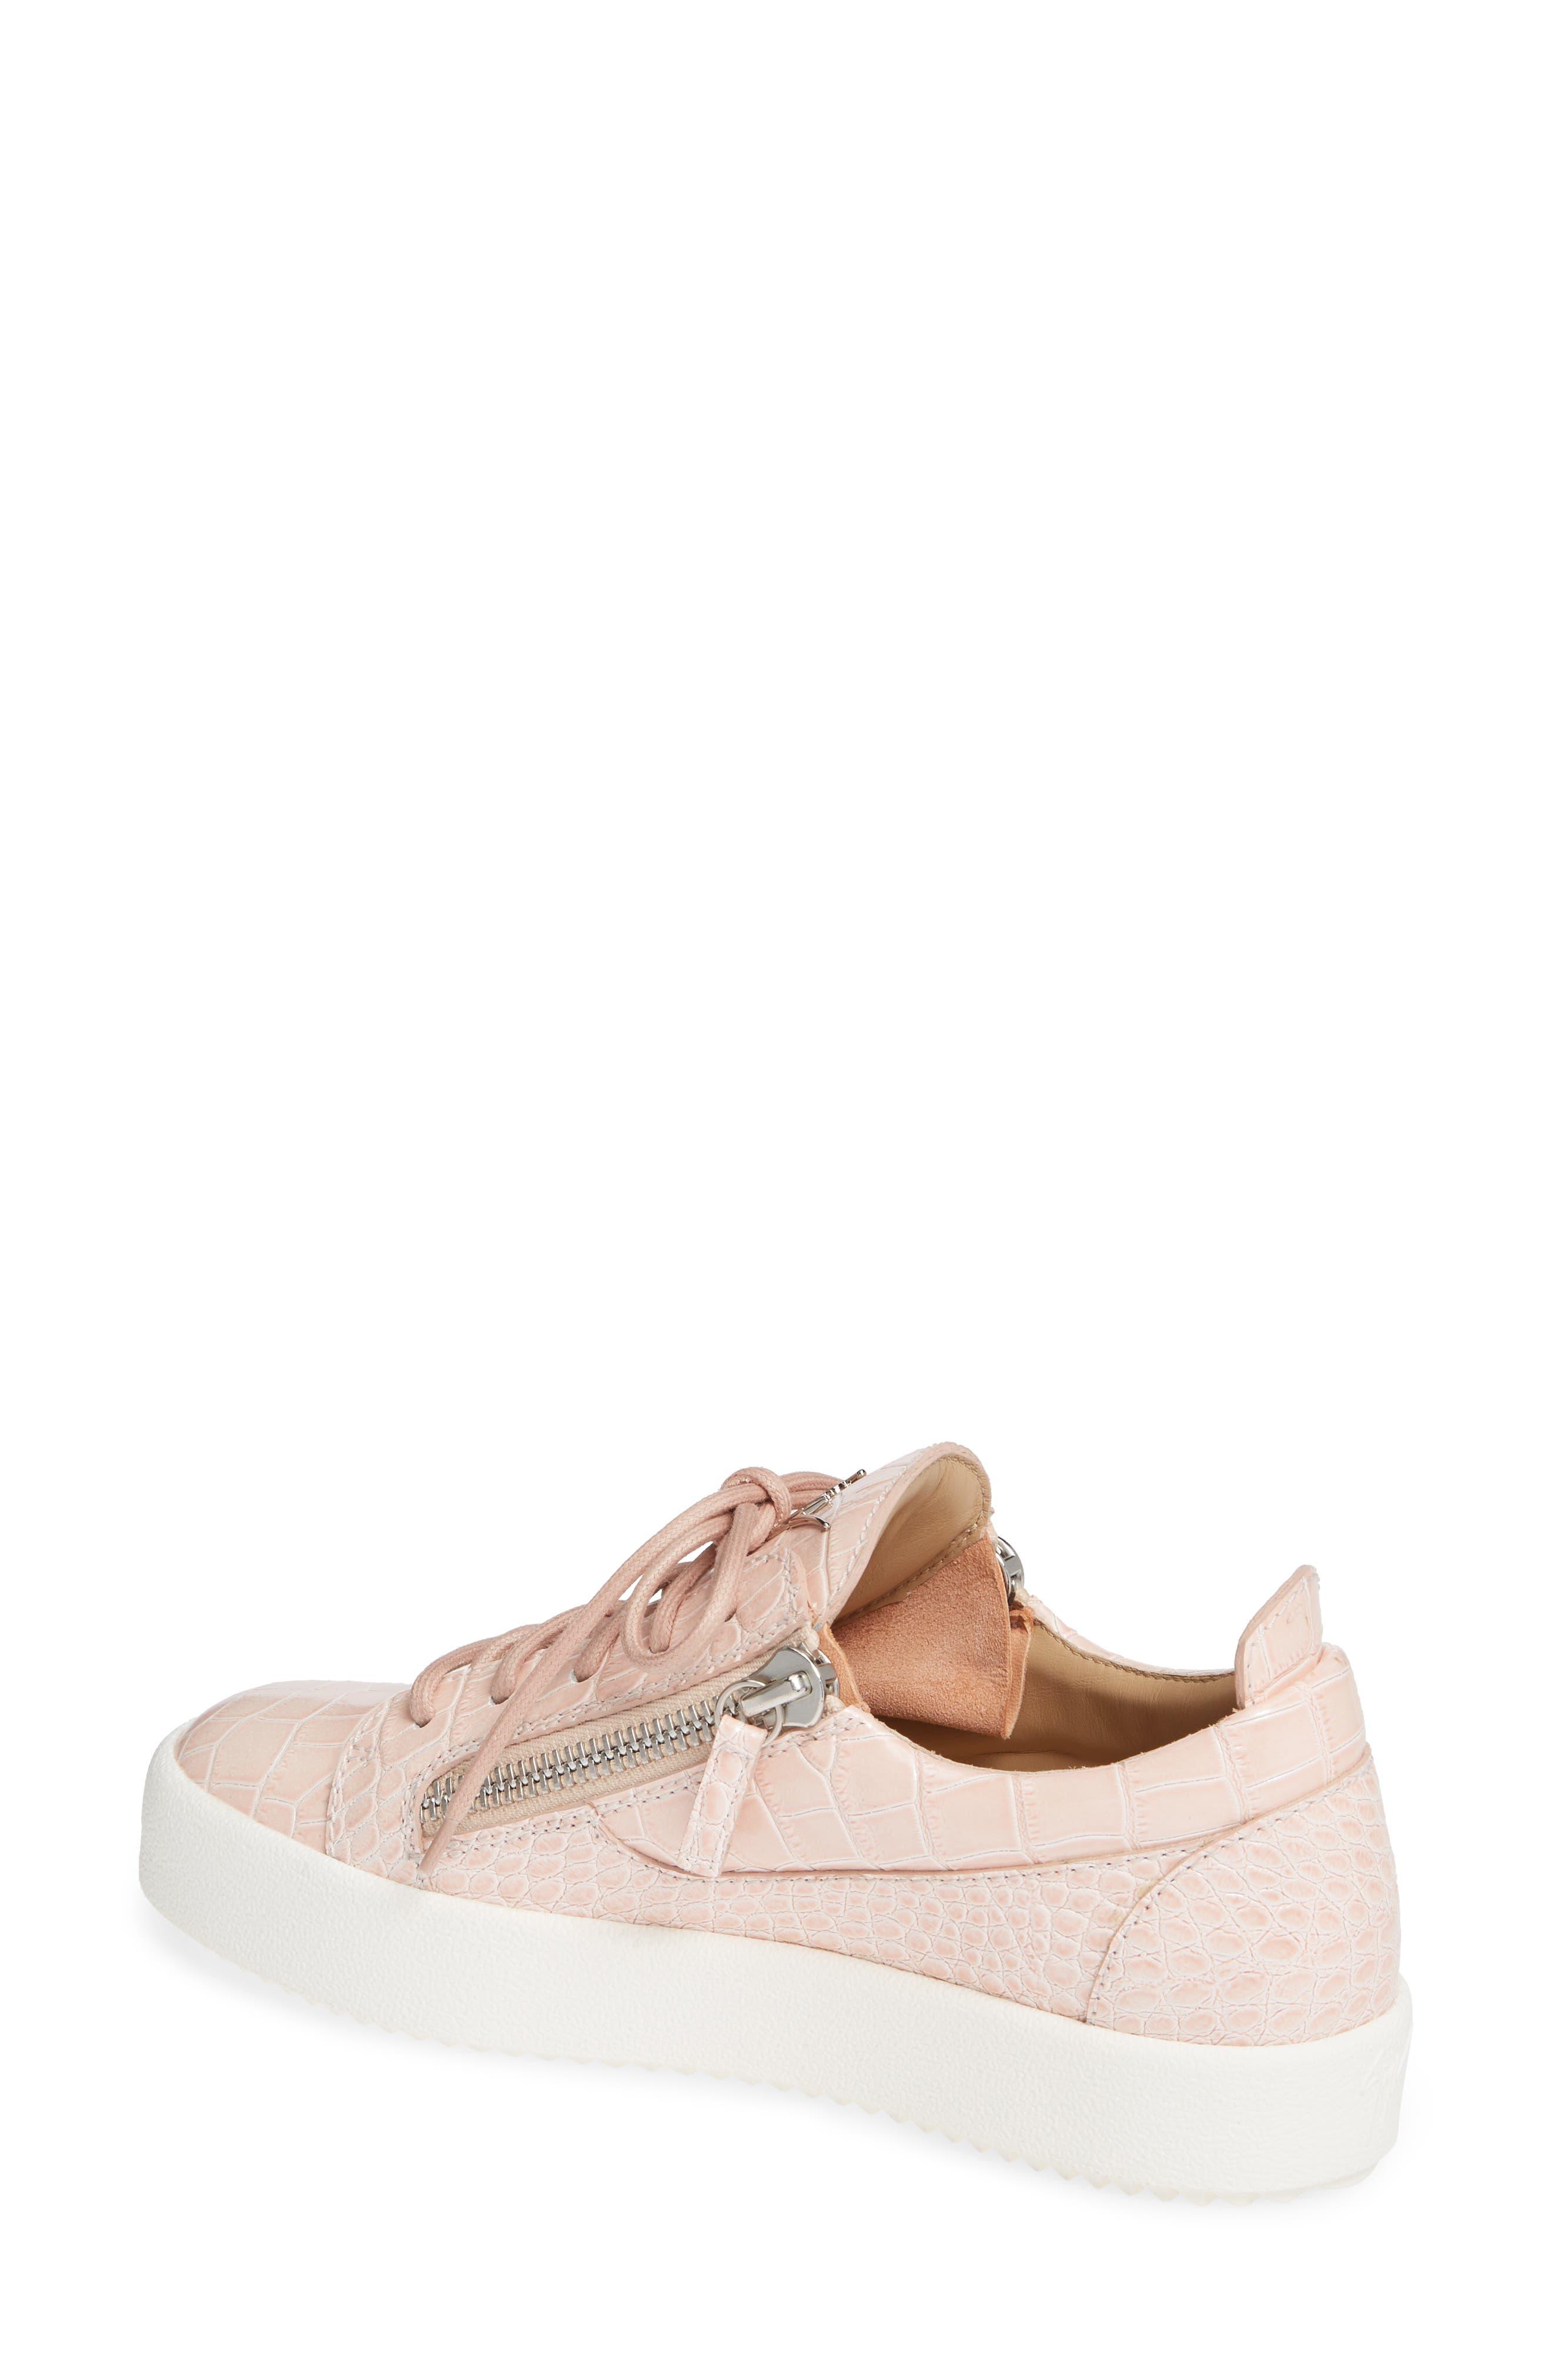 Low Top Sneaker,                             Alternate thumbnail 2, color,                             NUDE PINK